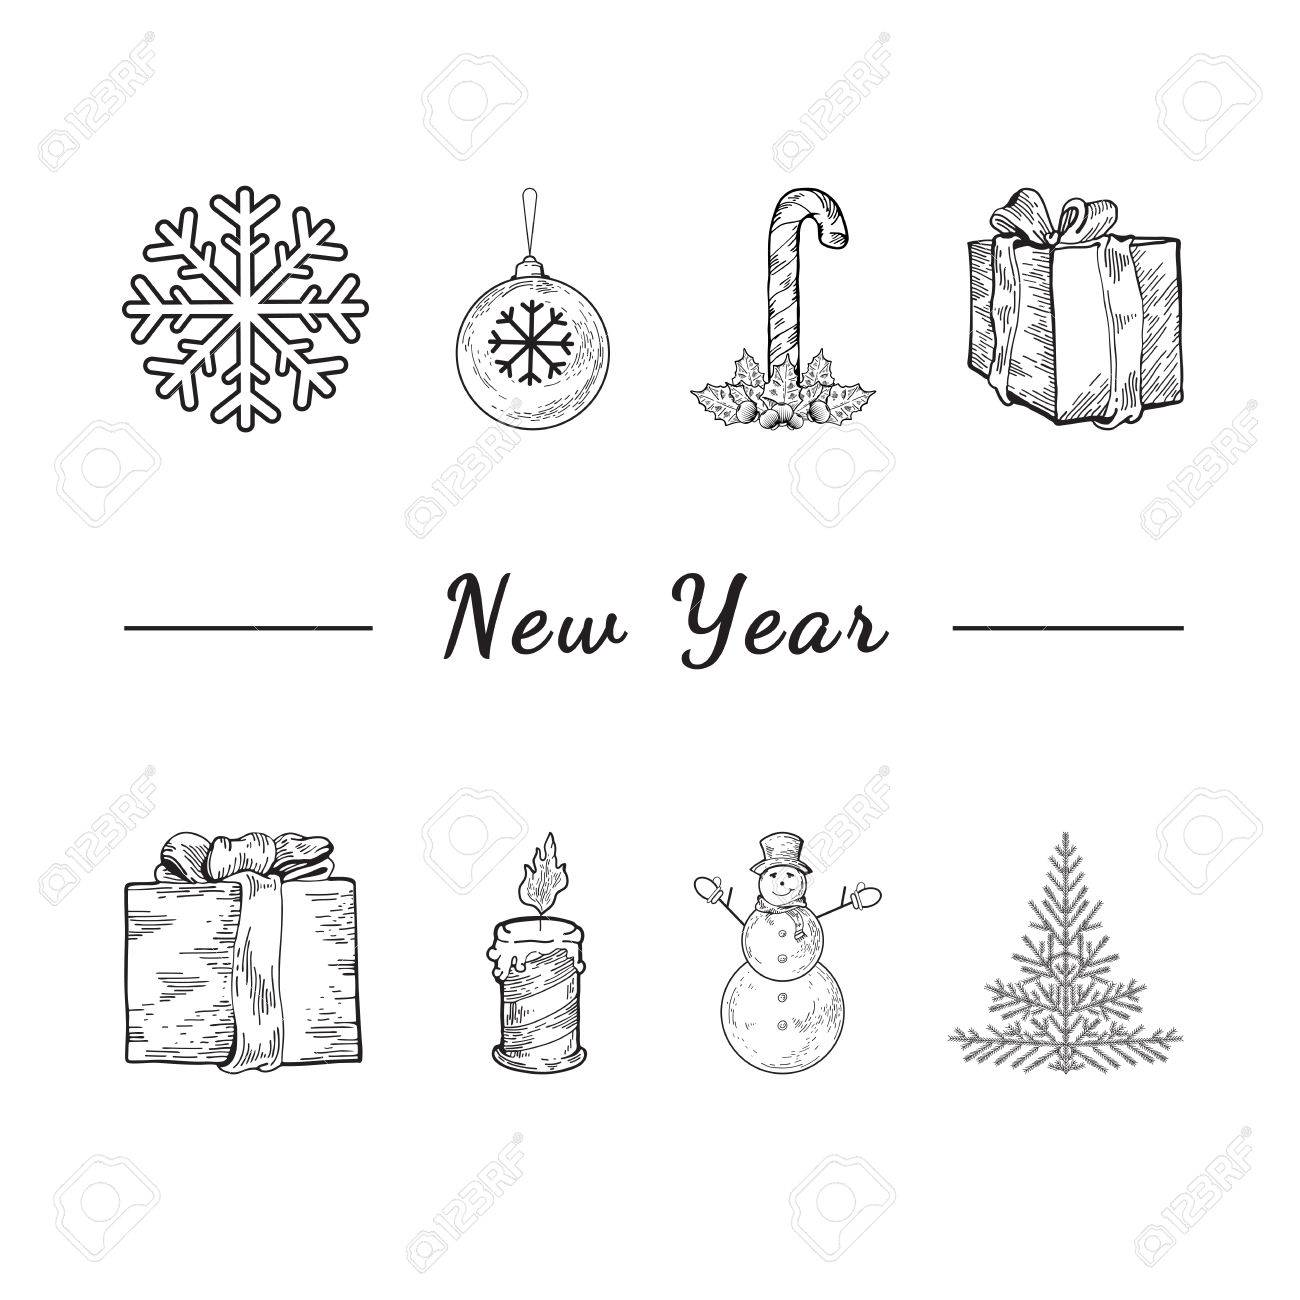 Christmas Template Flyer Celebration Concept